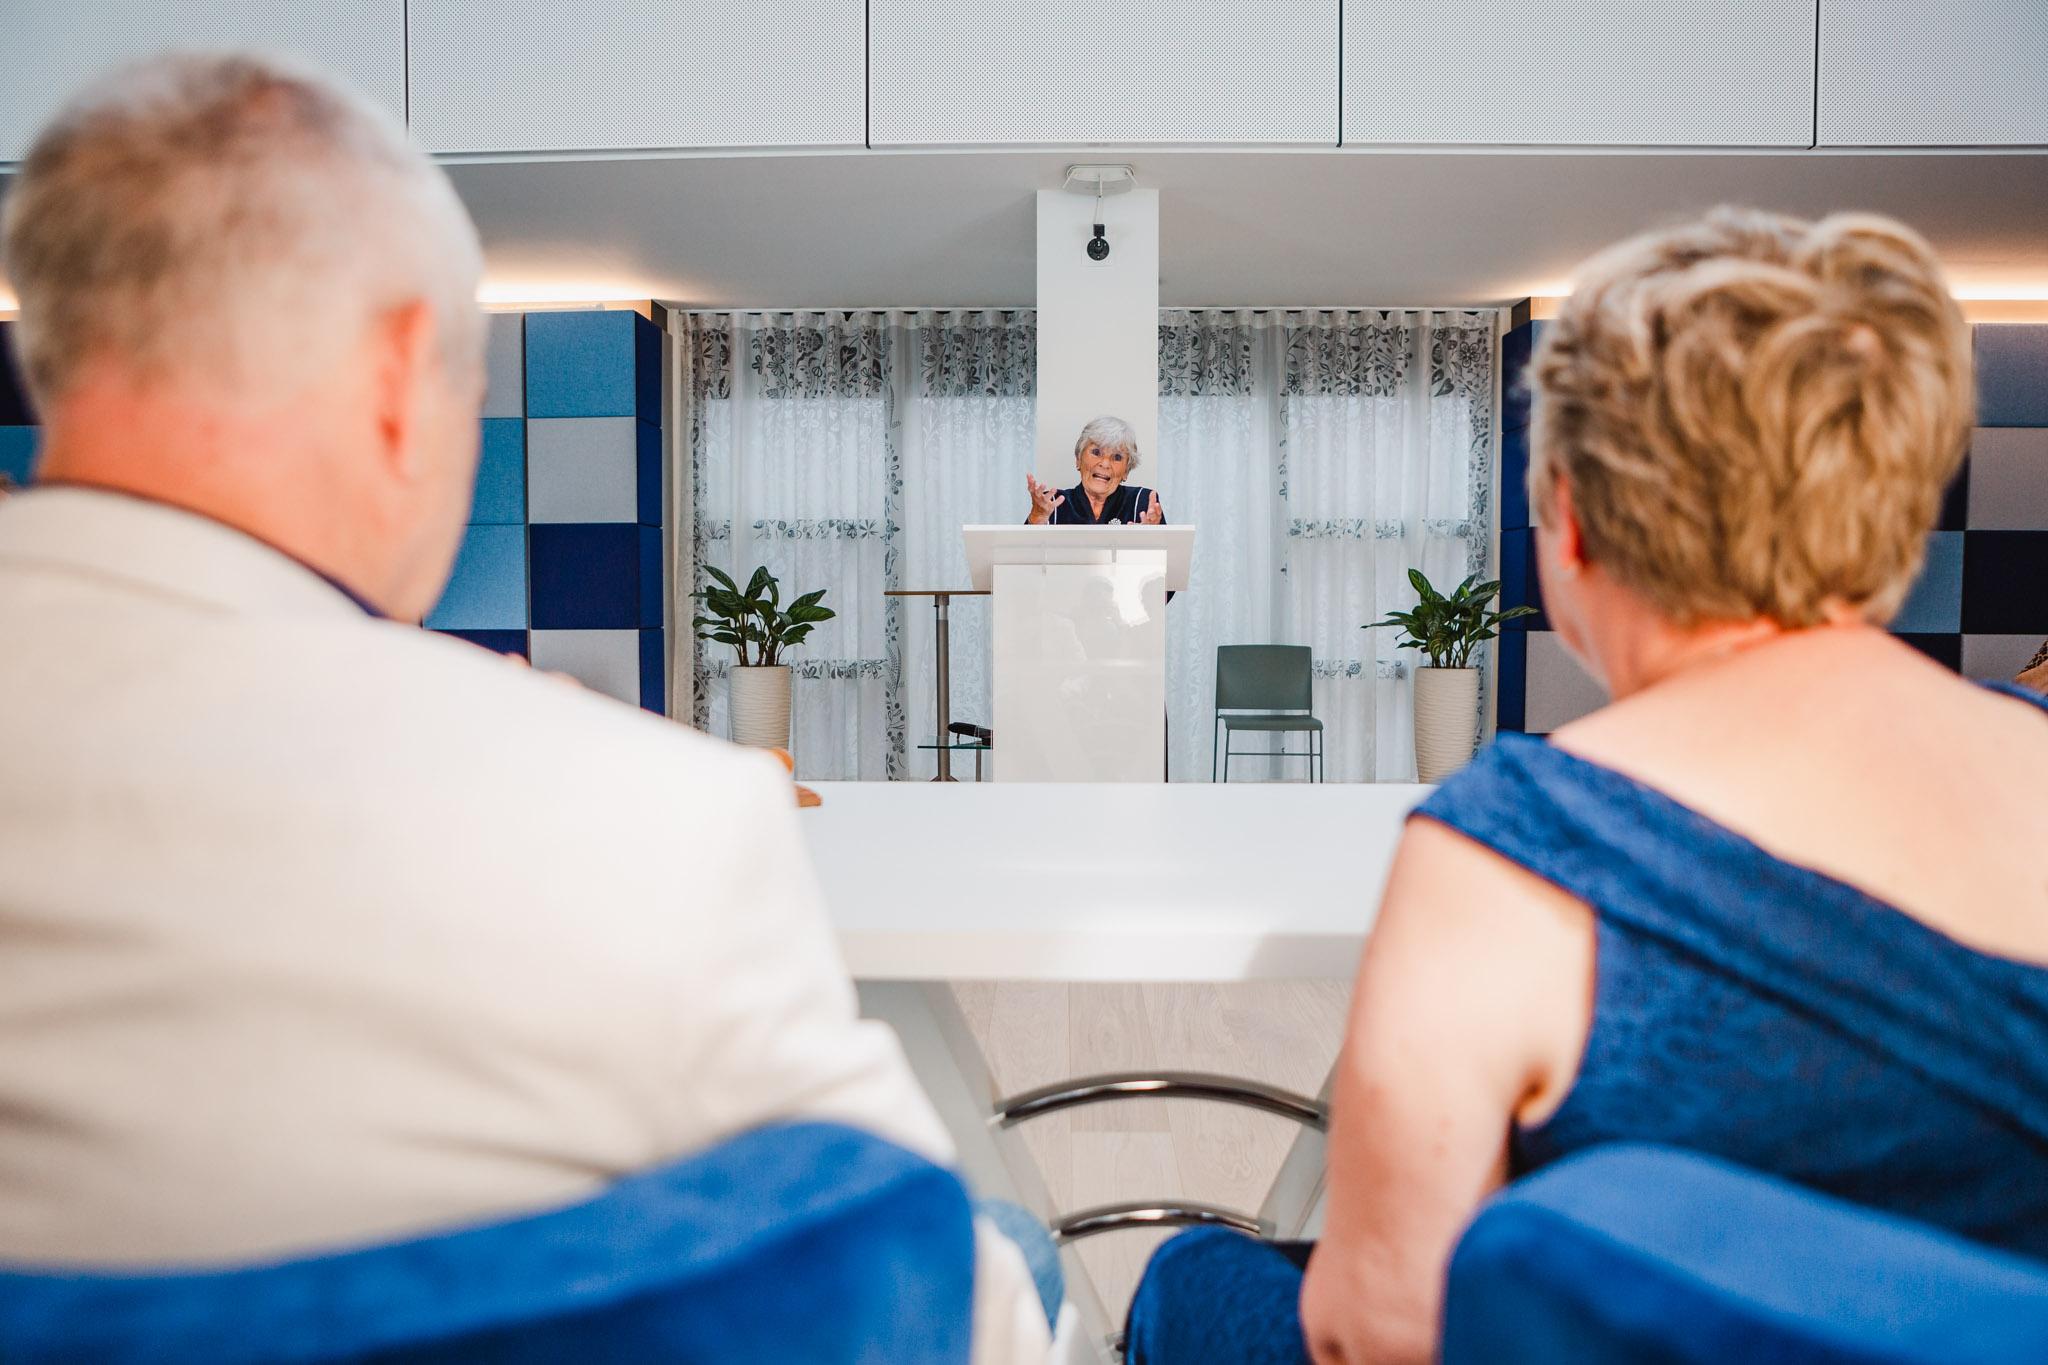 Bruiloft Reportage Geregistreerd Partnerschap Flevoland Lelystad Shot By Sylla 18